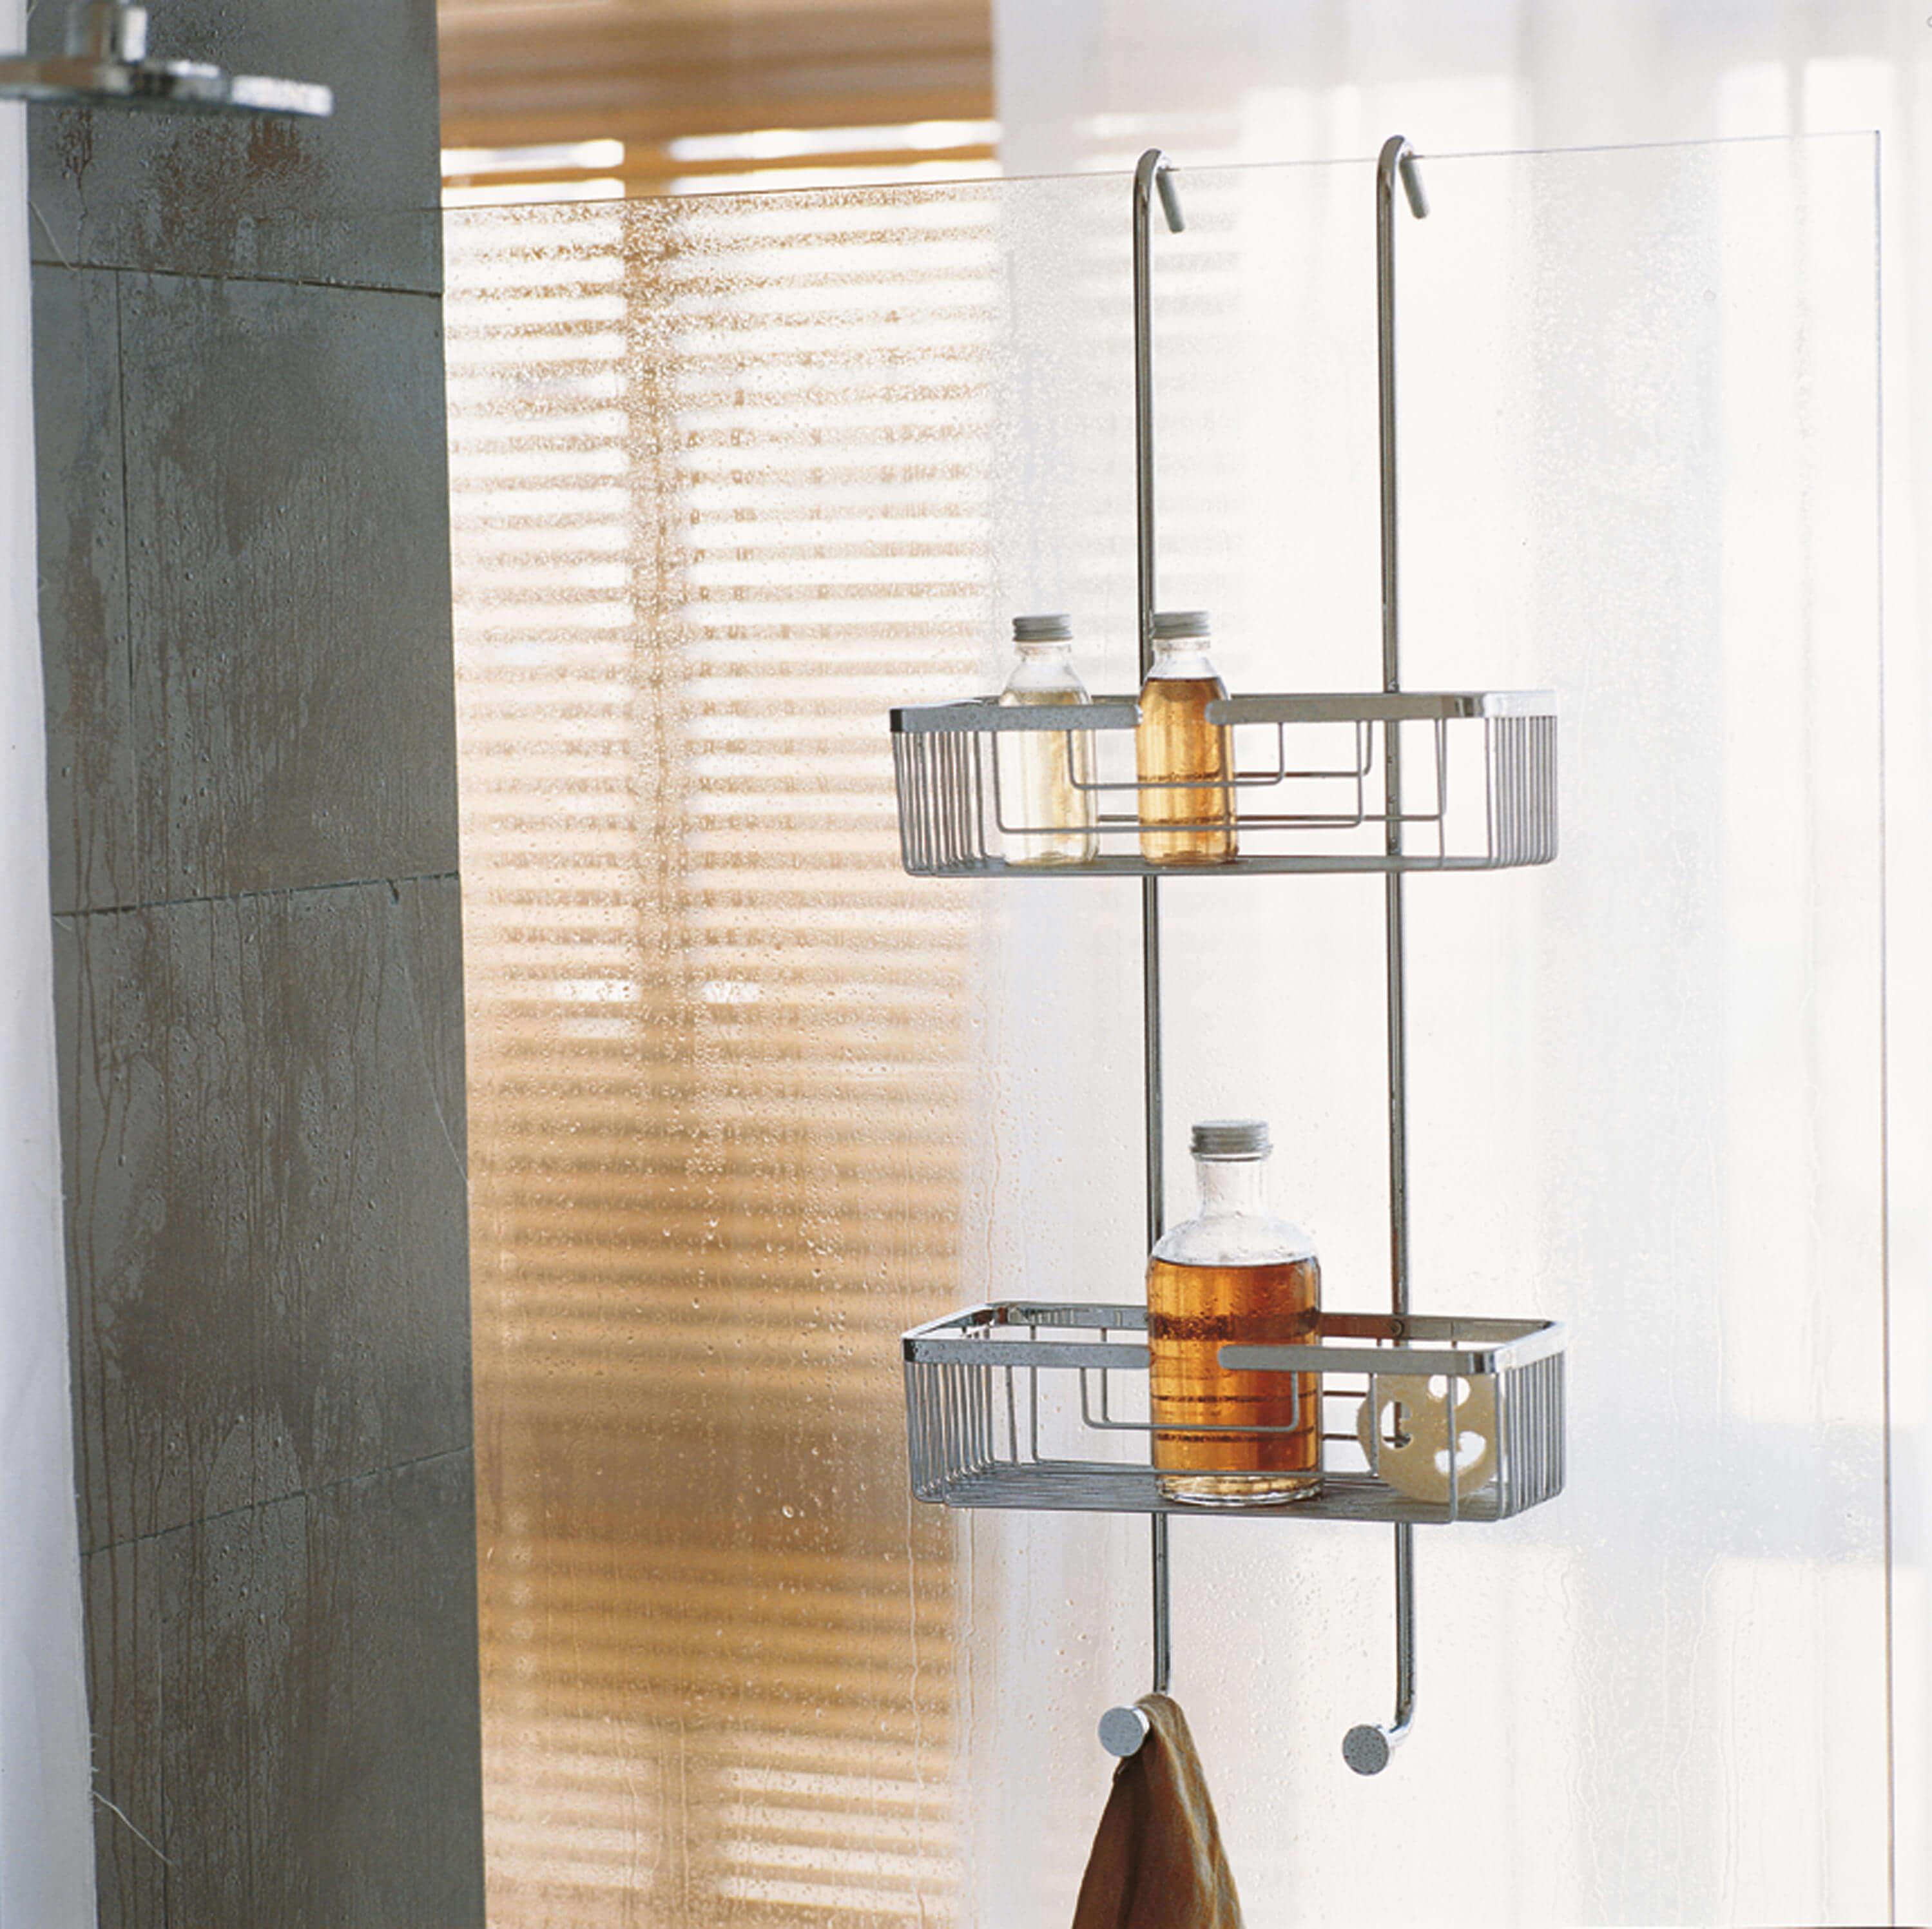 pomd or spanische leidenschaft im badezimmer. Black Bedroom Furniture Sets. Home Design Ideas